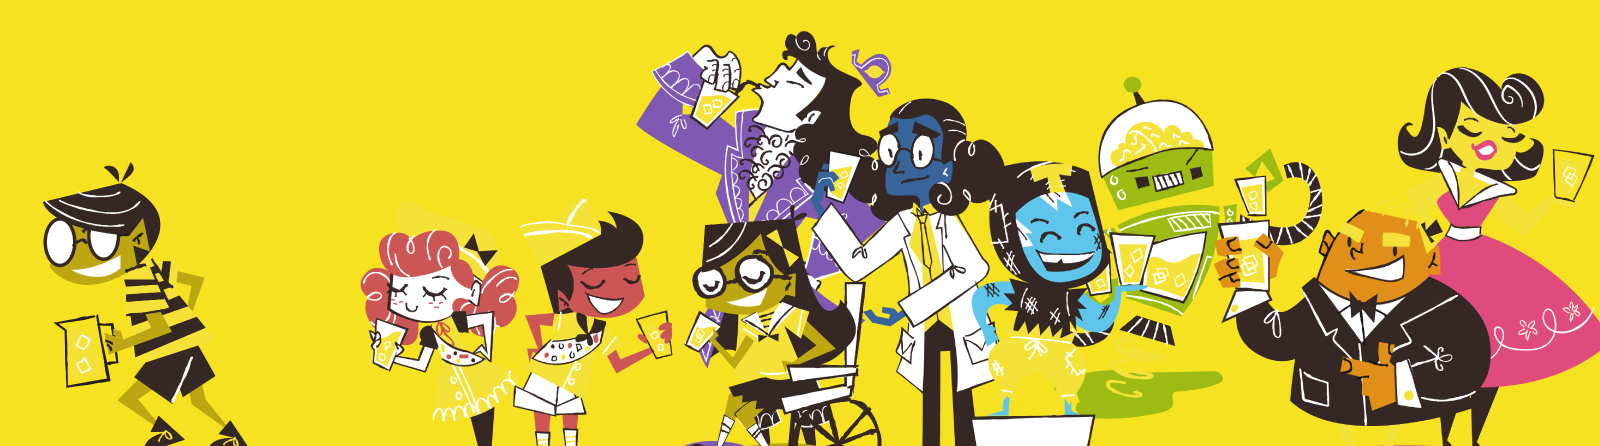 yellow-bg-characters.png